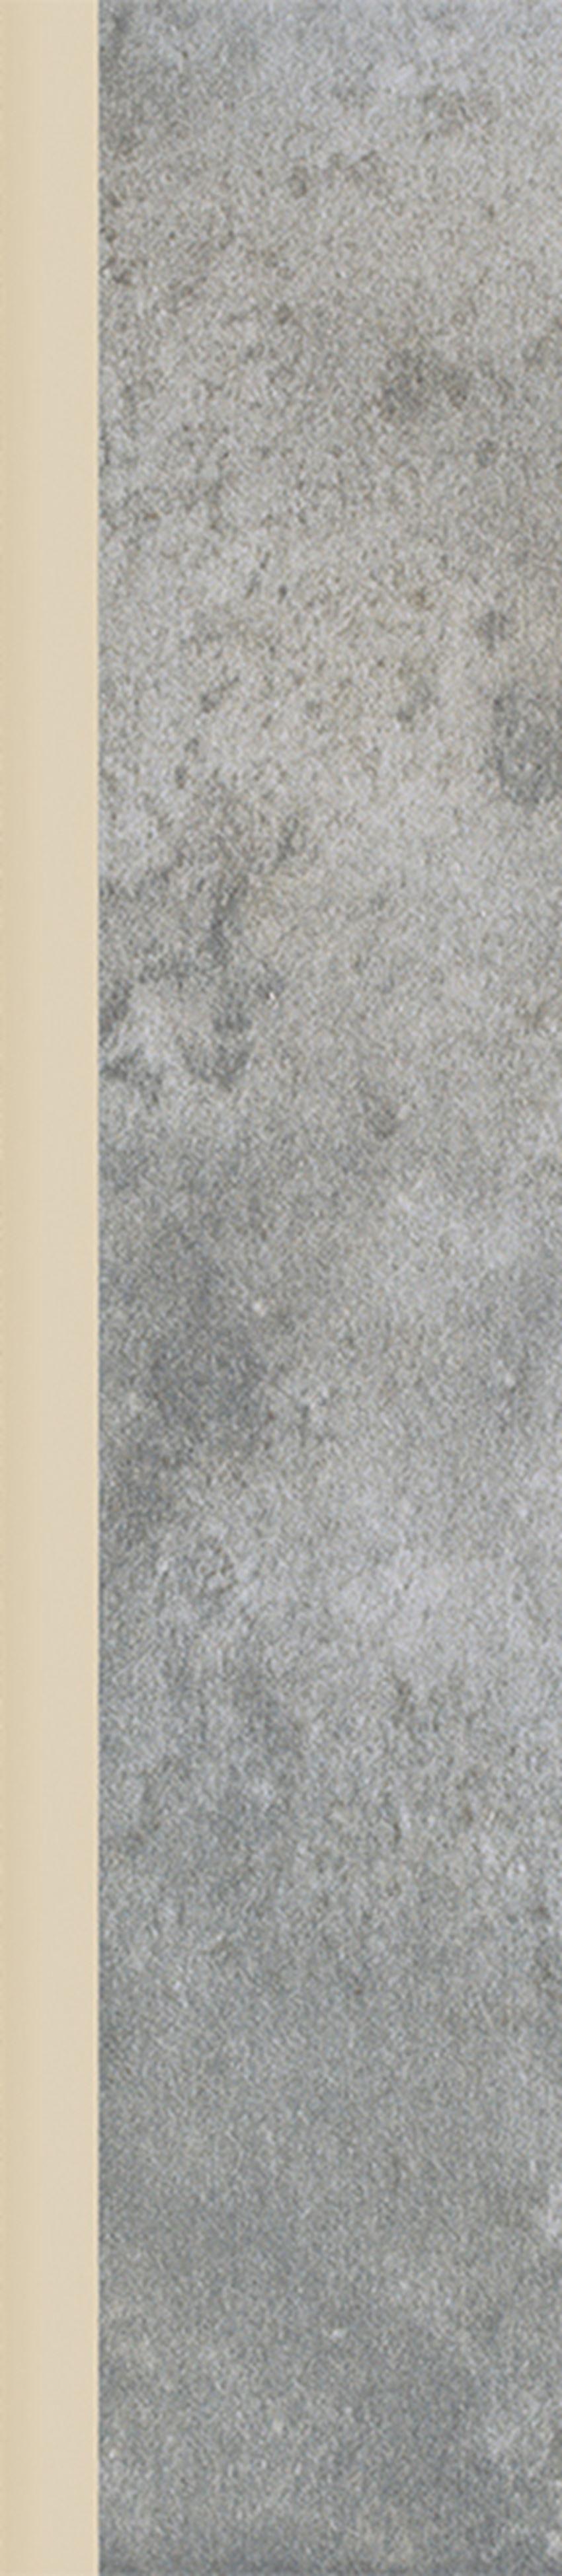 Płytka cokołowa 7,2x33 cm  Paradyż Corrado Grafit Cokół Mat